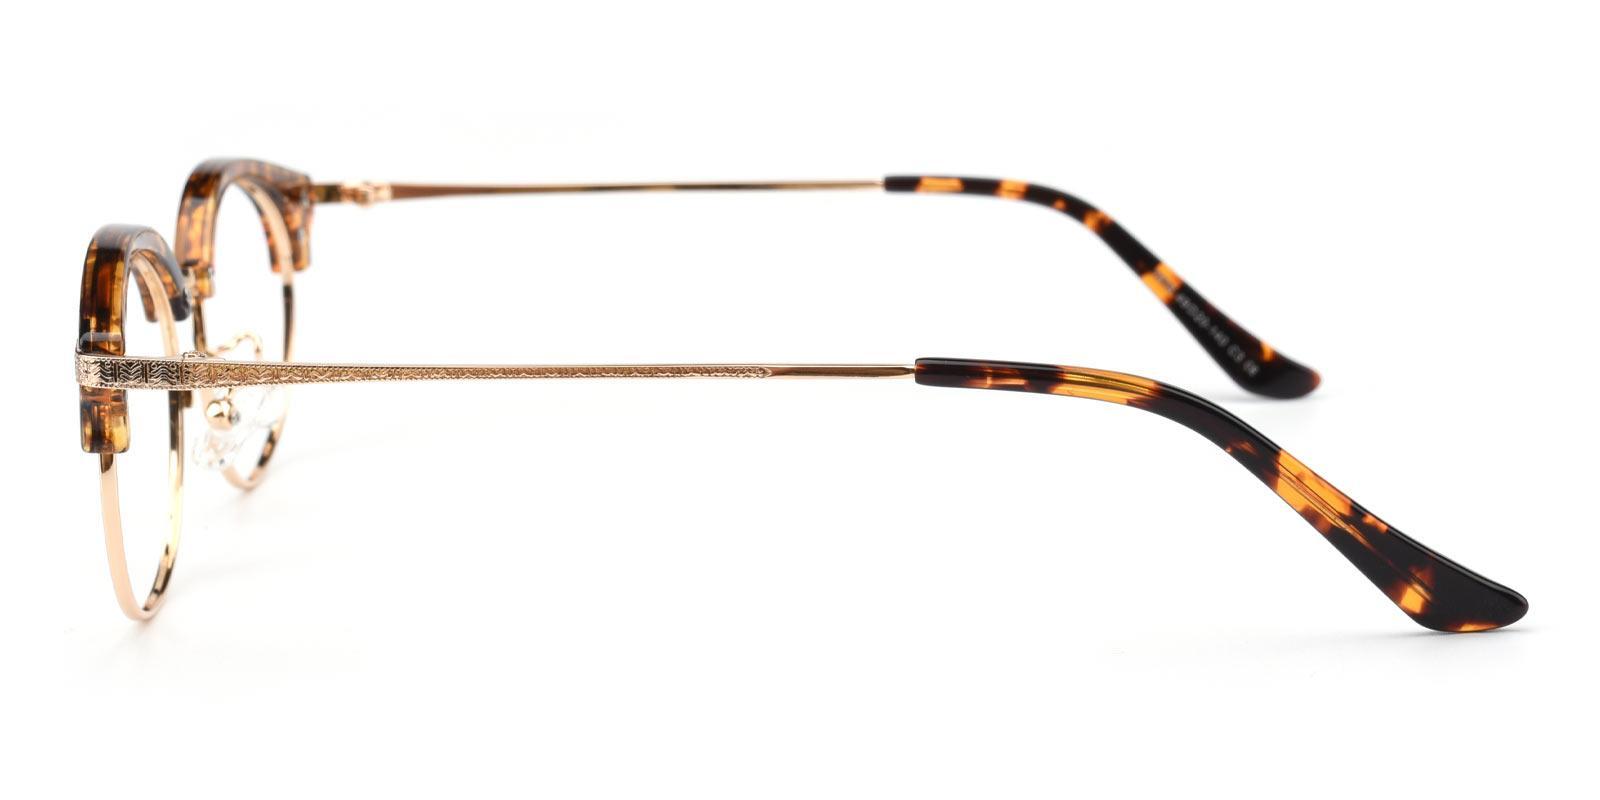 Phyllis-Tortoise-Browline-Combination-Eyeglasses-detail